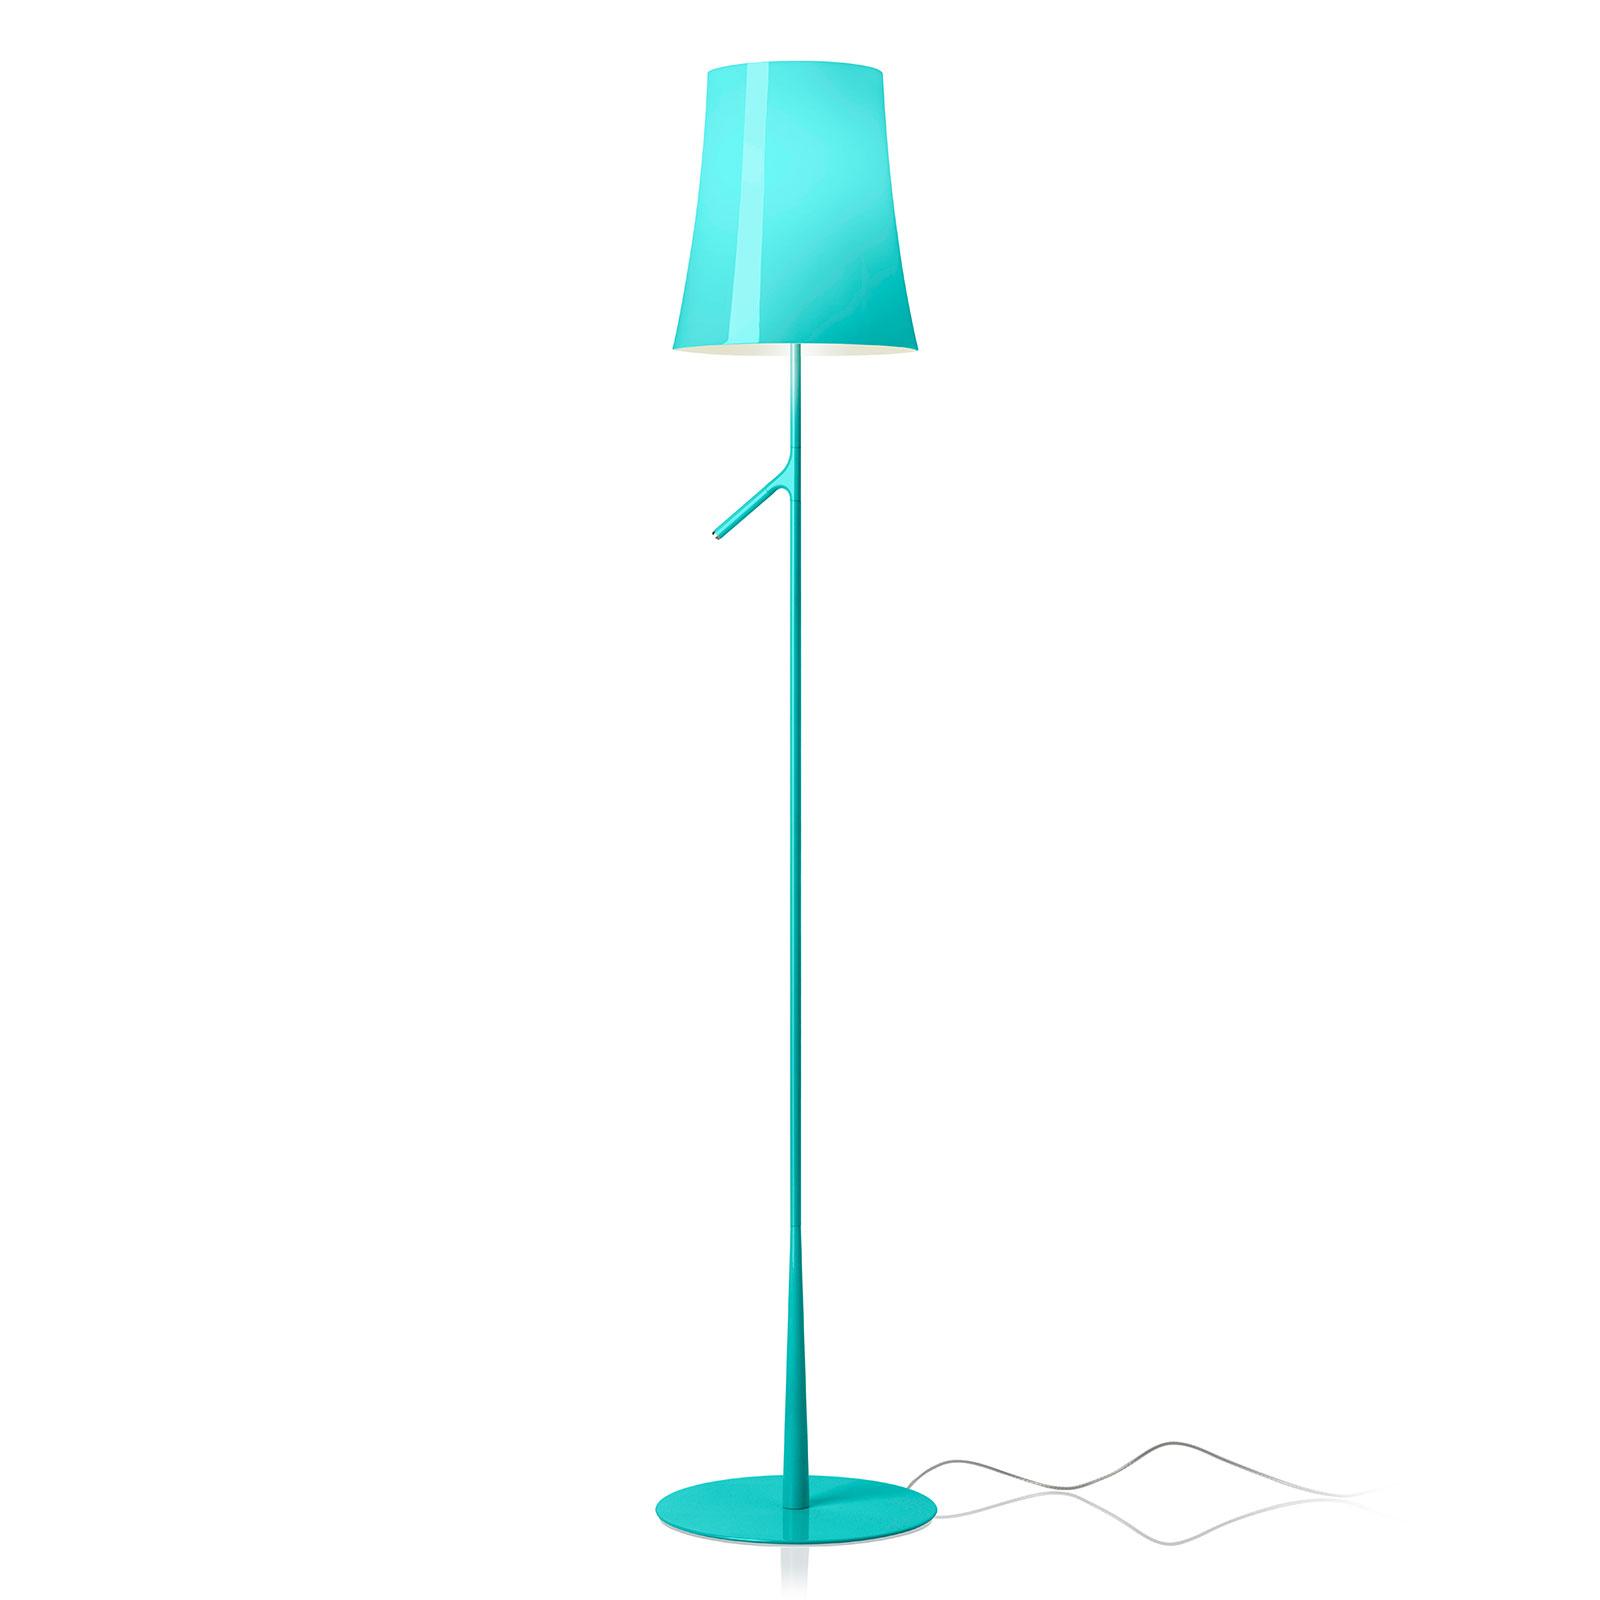 Foscarini Birdie LED Lettura gulvlampe marineblå